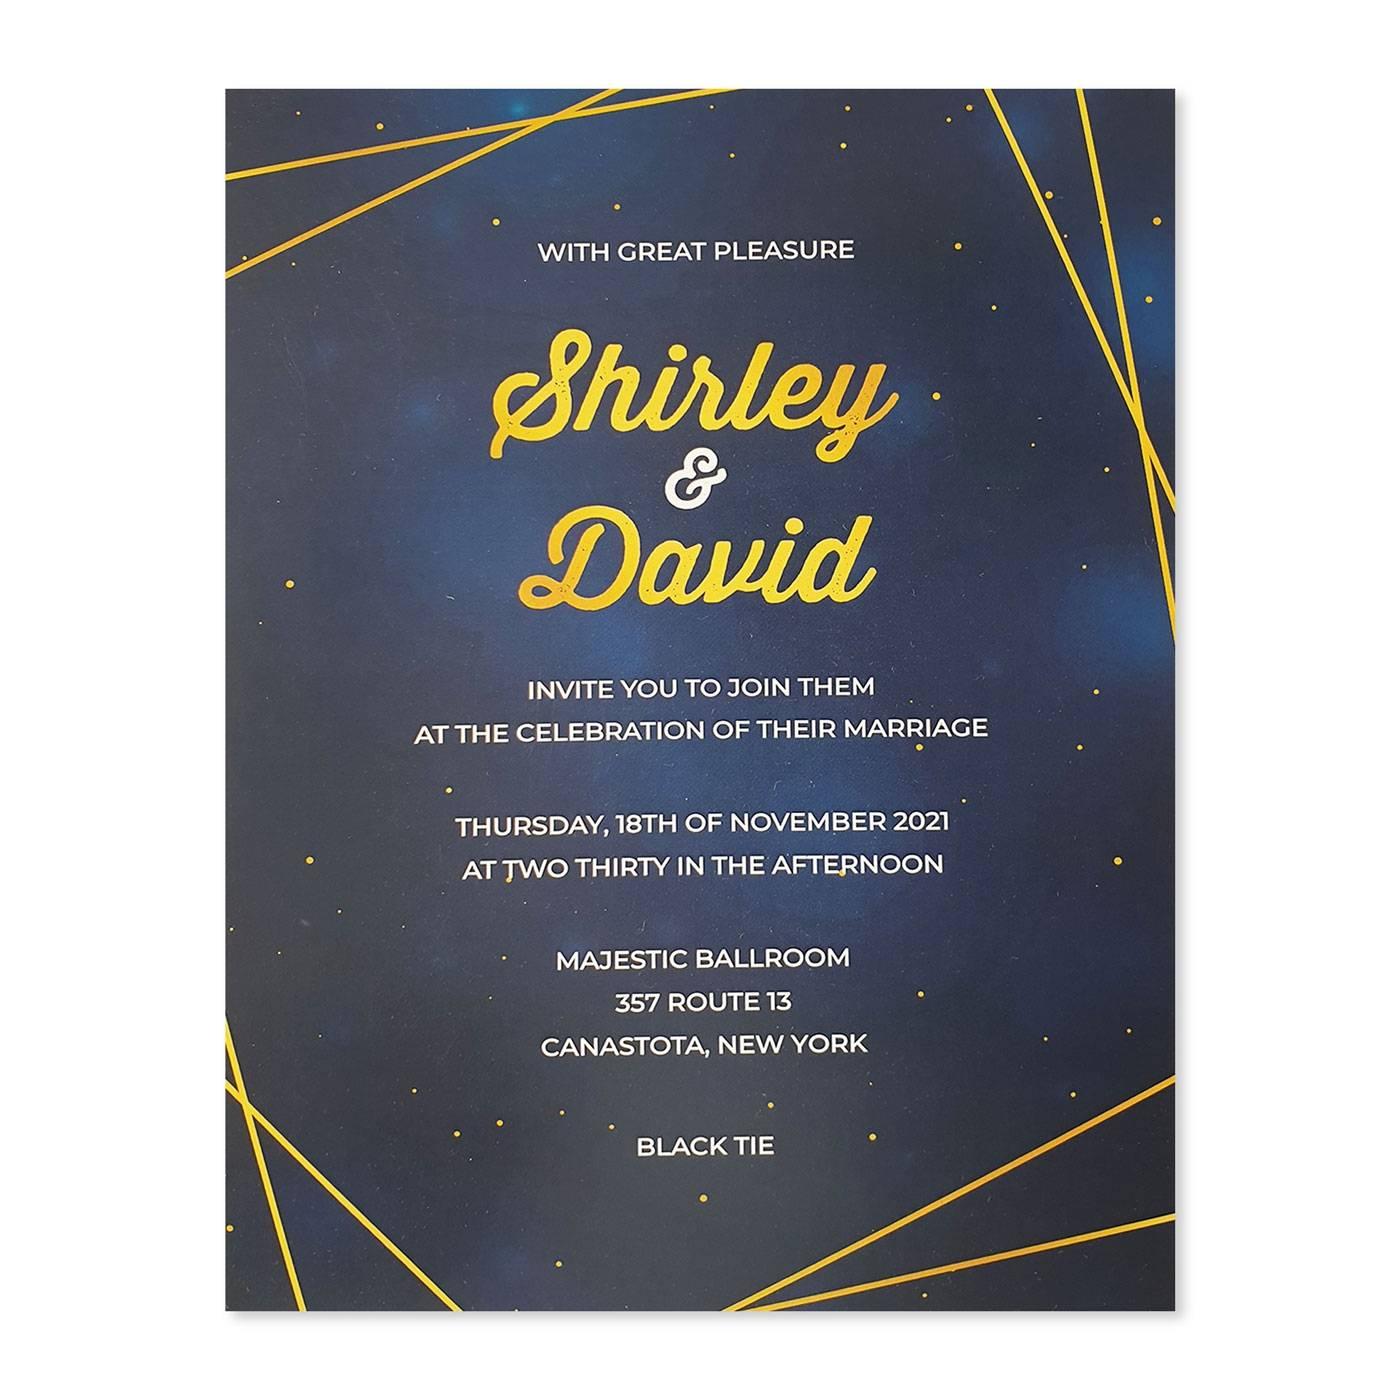 WHITE GLOSSY WEDDING INVITATION : SPARKLING_GALAXY - 123WeddingCards